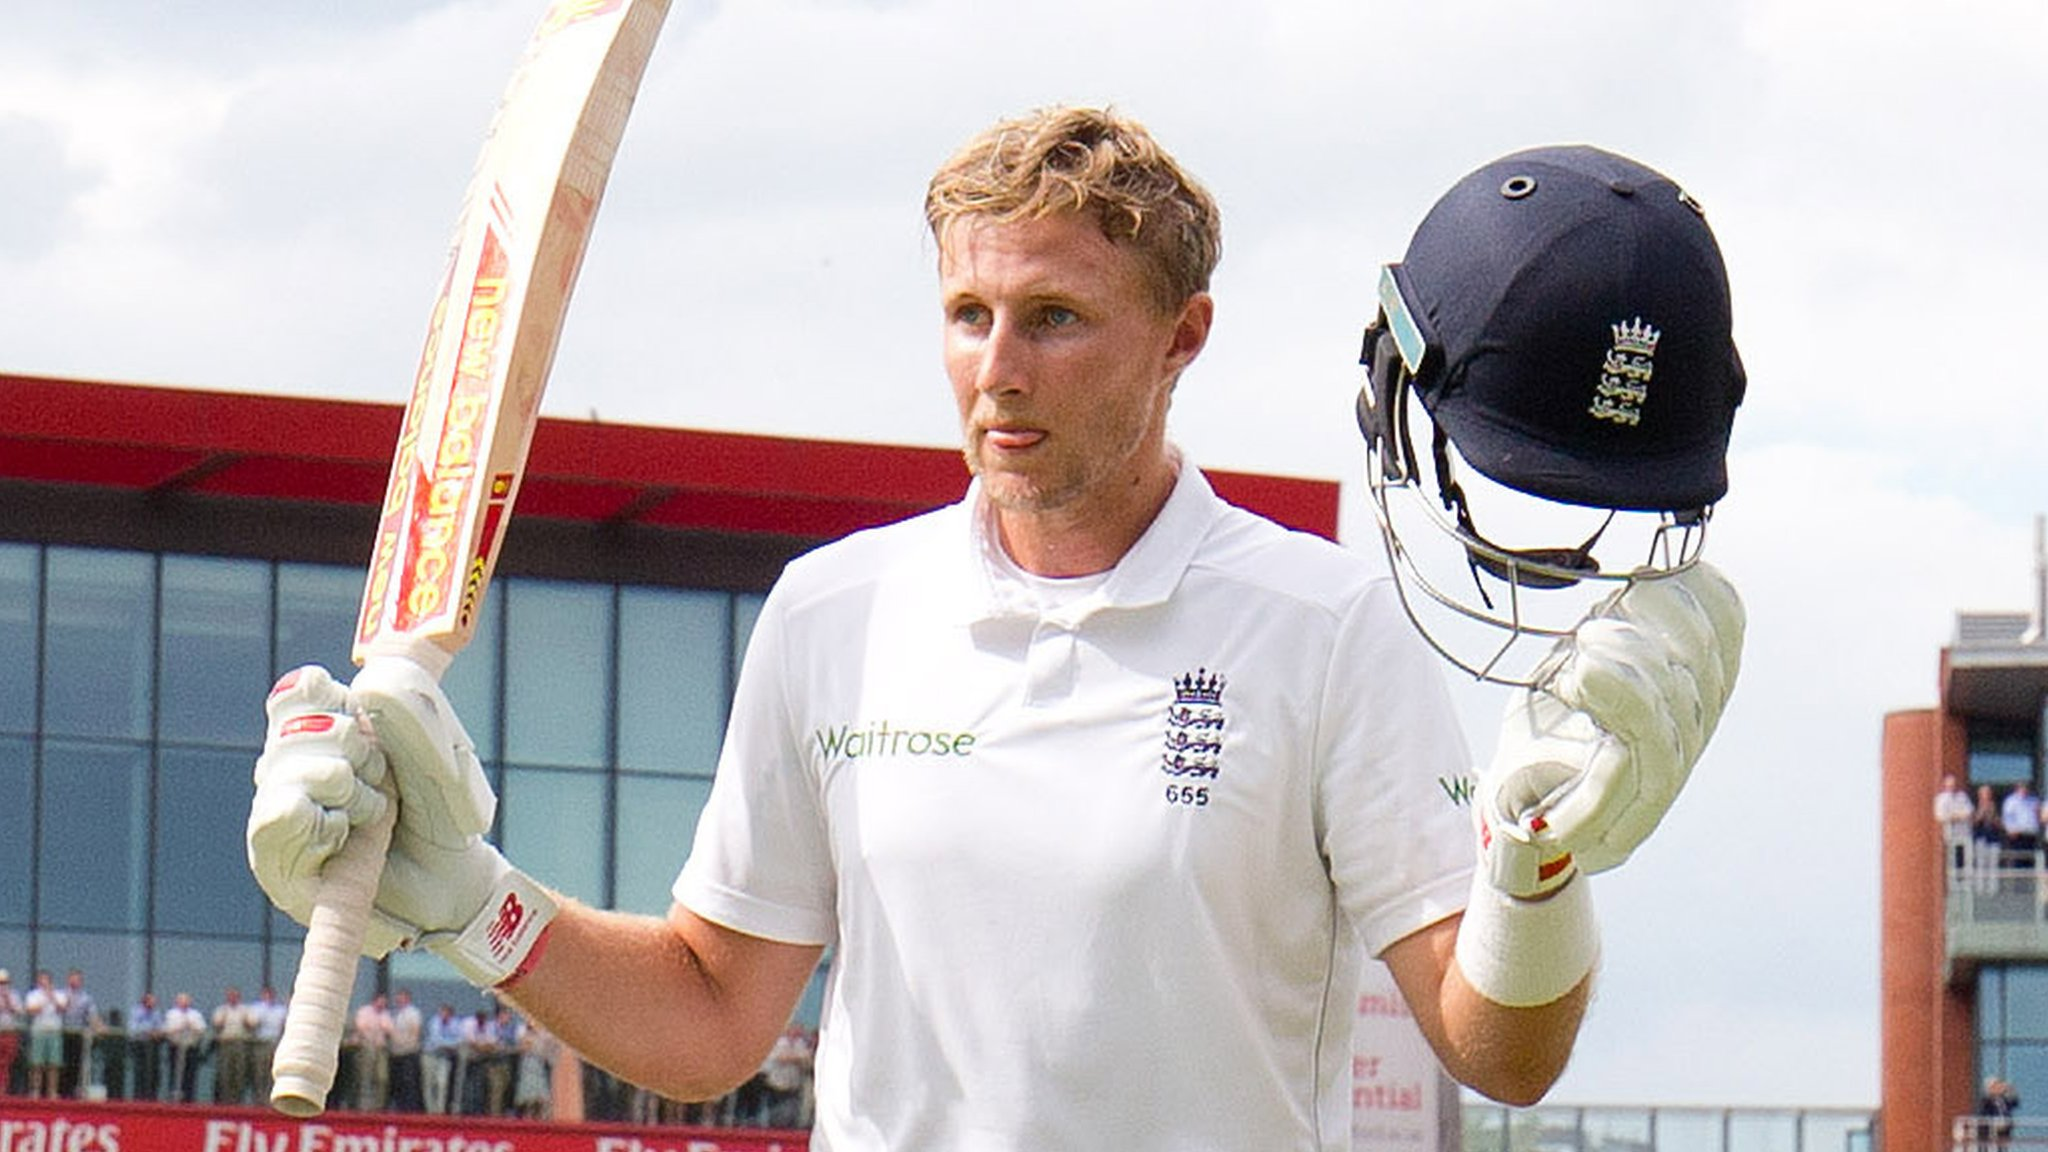 England v Pakistan: Joe Root hits 254 as hosts dominate at Old Trafford